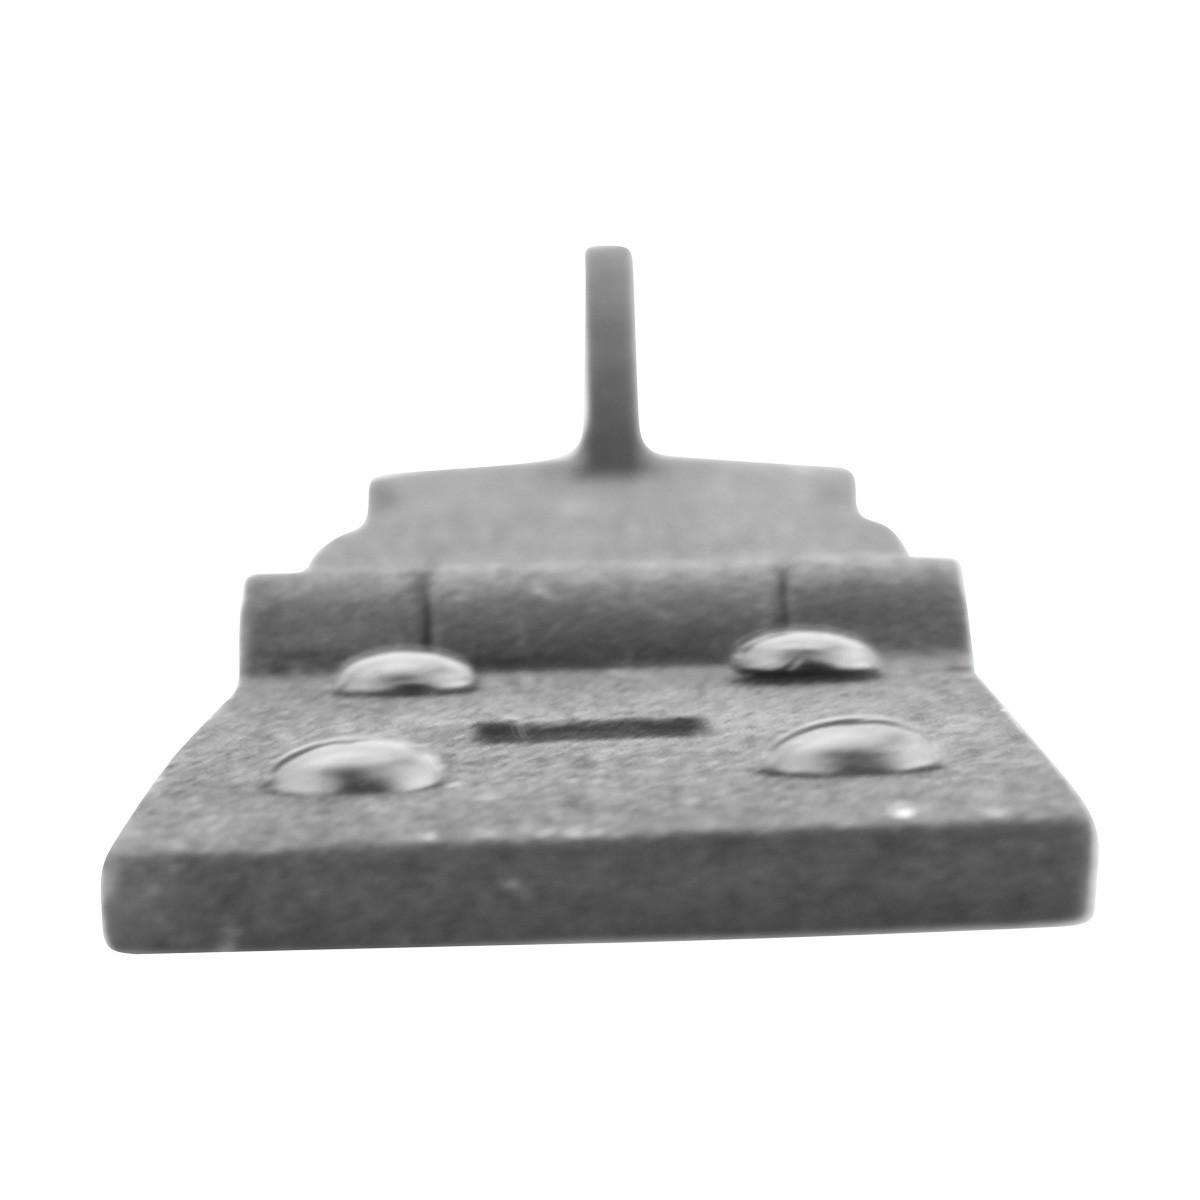 Hasp Black Wrought Iron 1 34 H x 8 12 W Wrought Iron Hasp Hasp Latch Black Iron Hasp